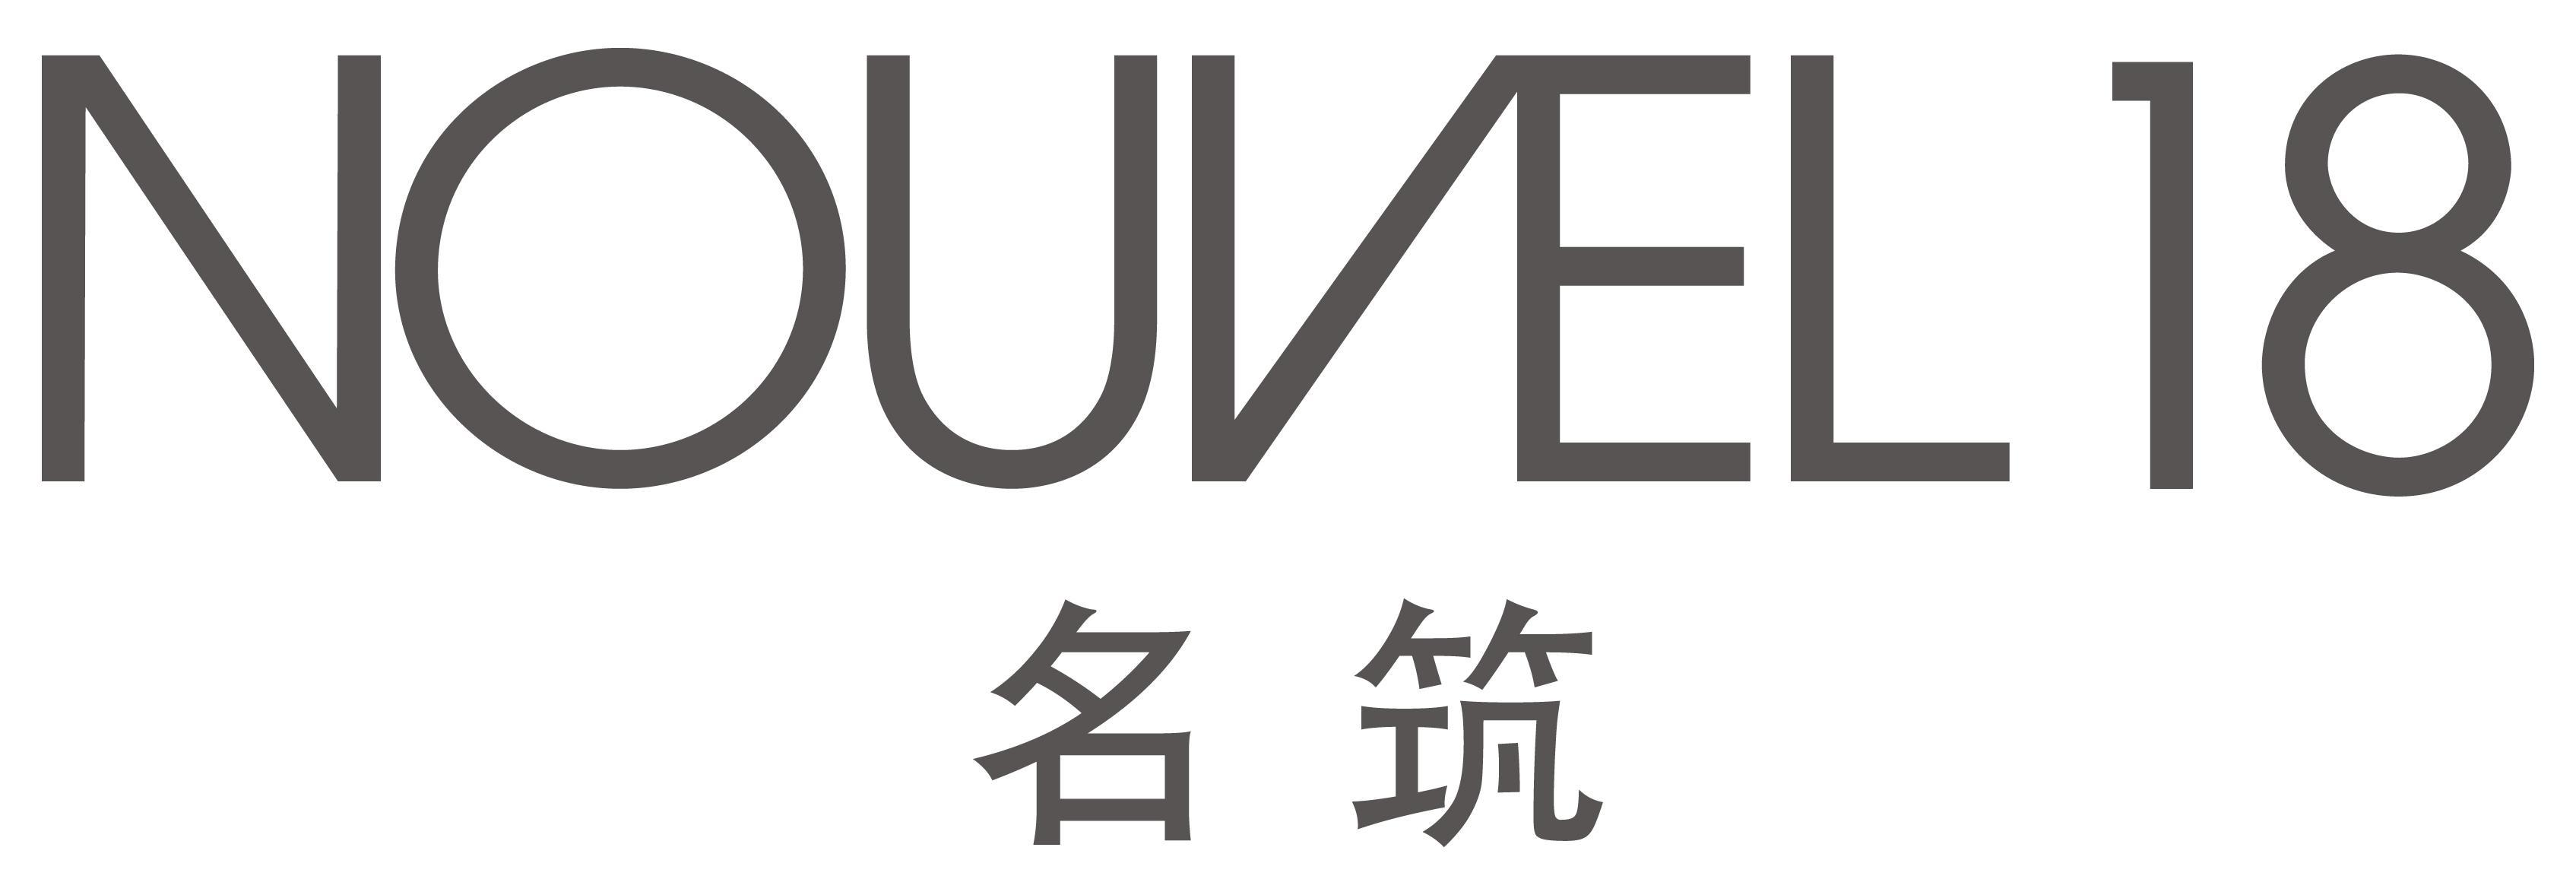 Nouvel 18 (名筑) image